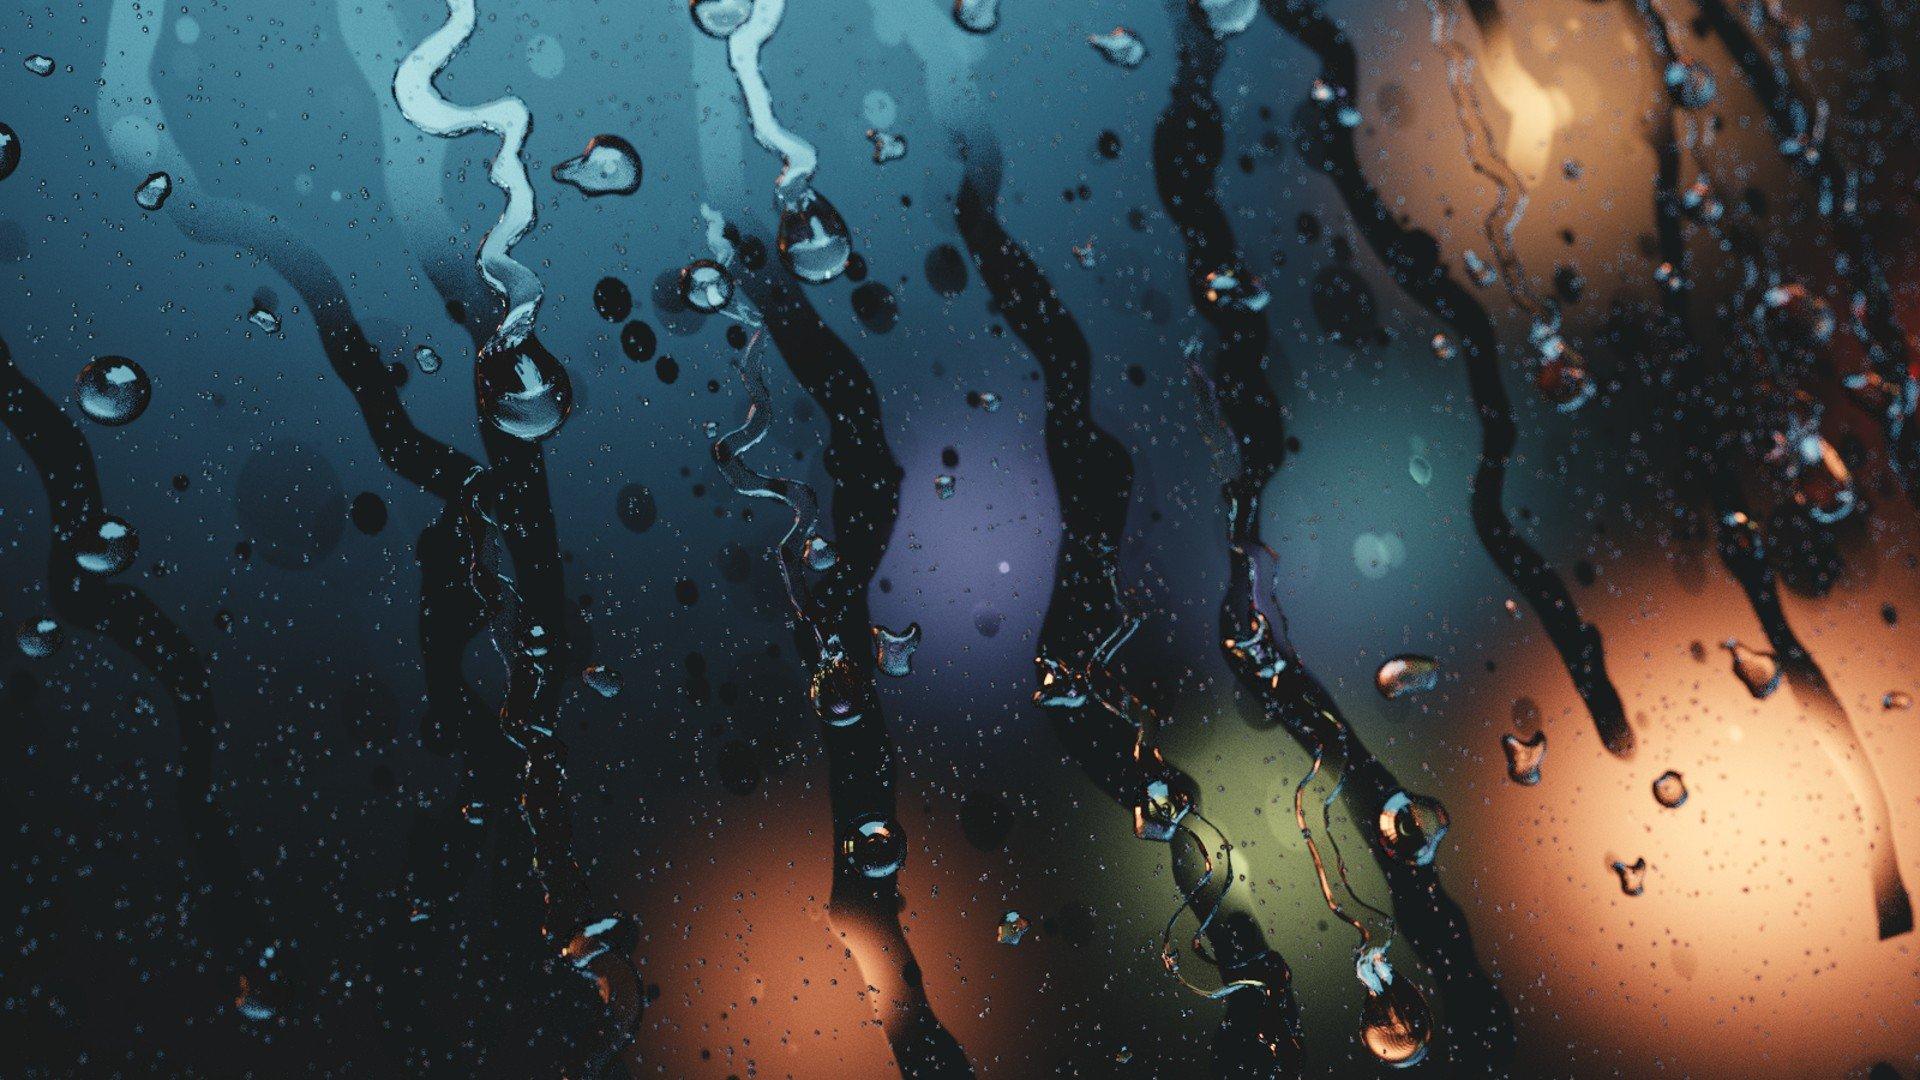 Water On Glass Streaks Blurred Hd Wallpapers Desktop And